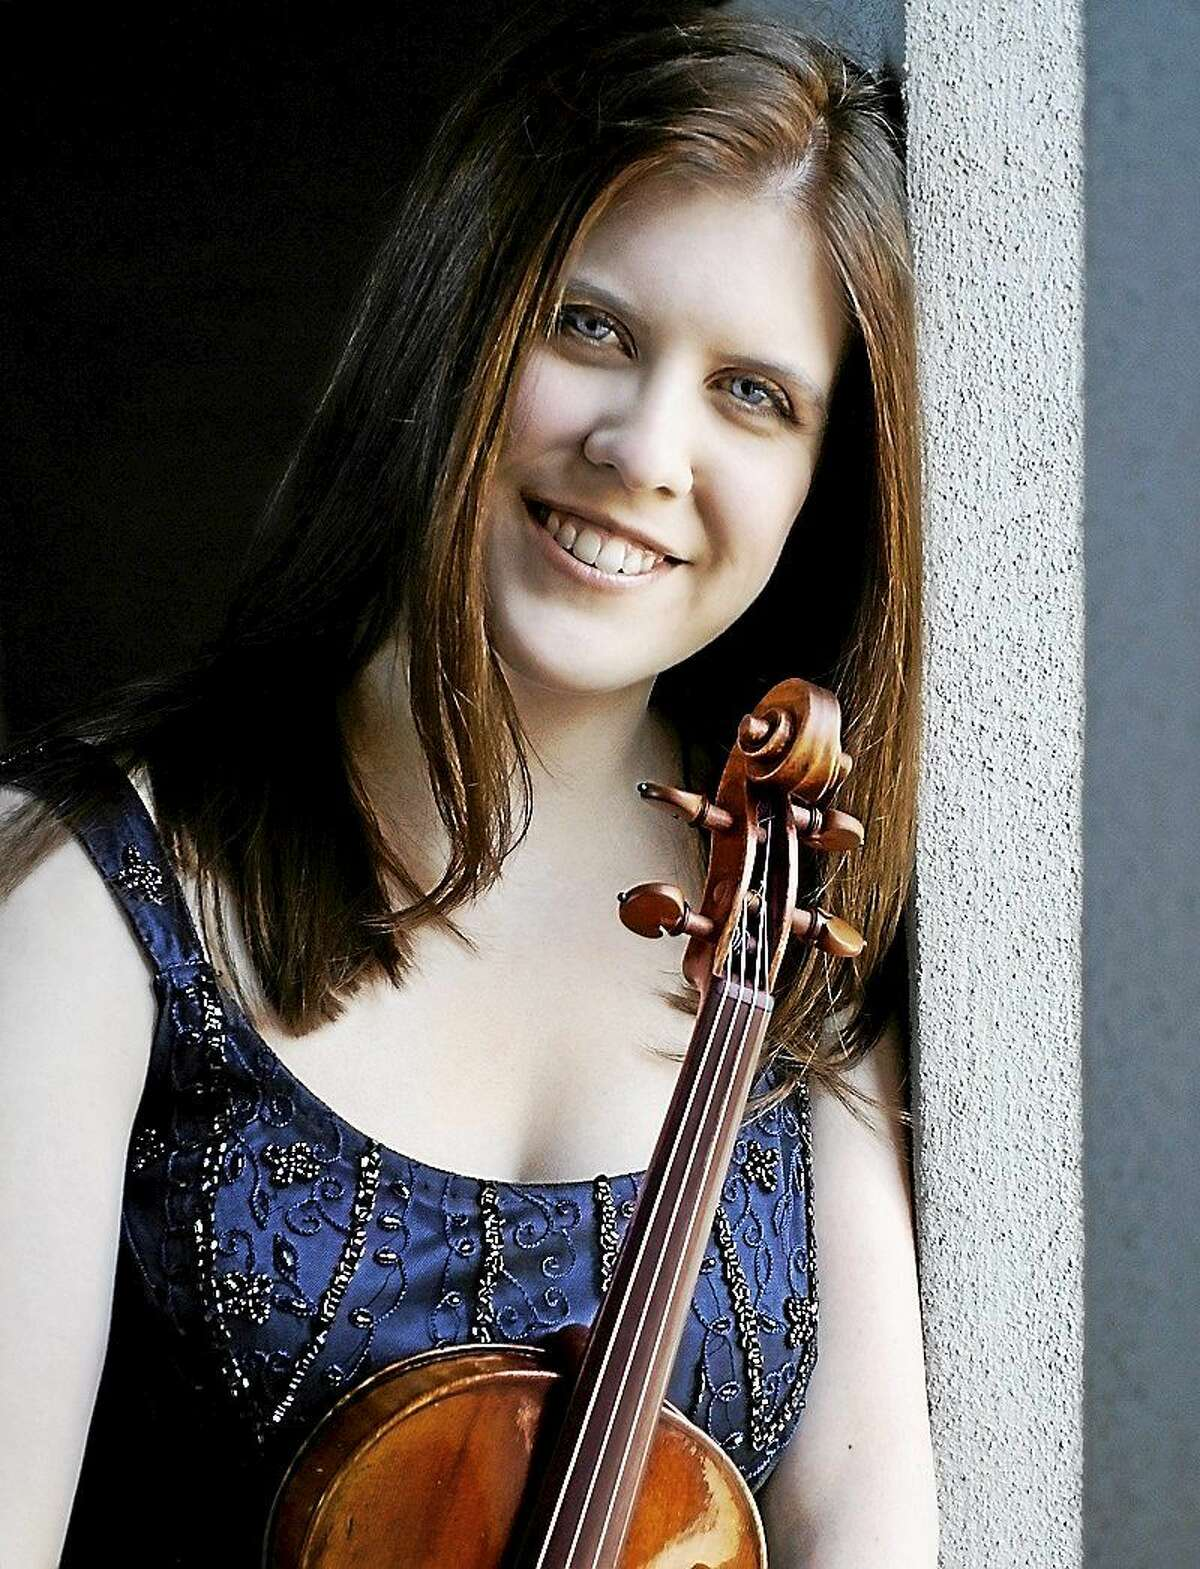 Violinist Erin Keefe